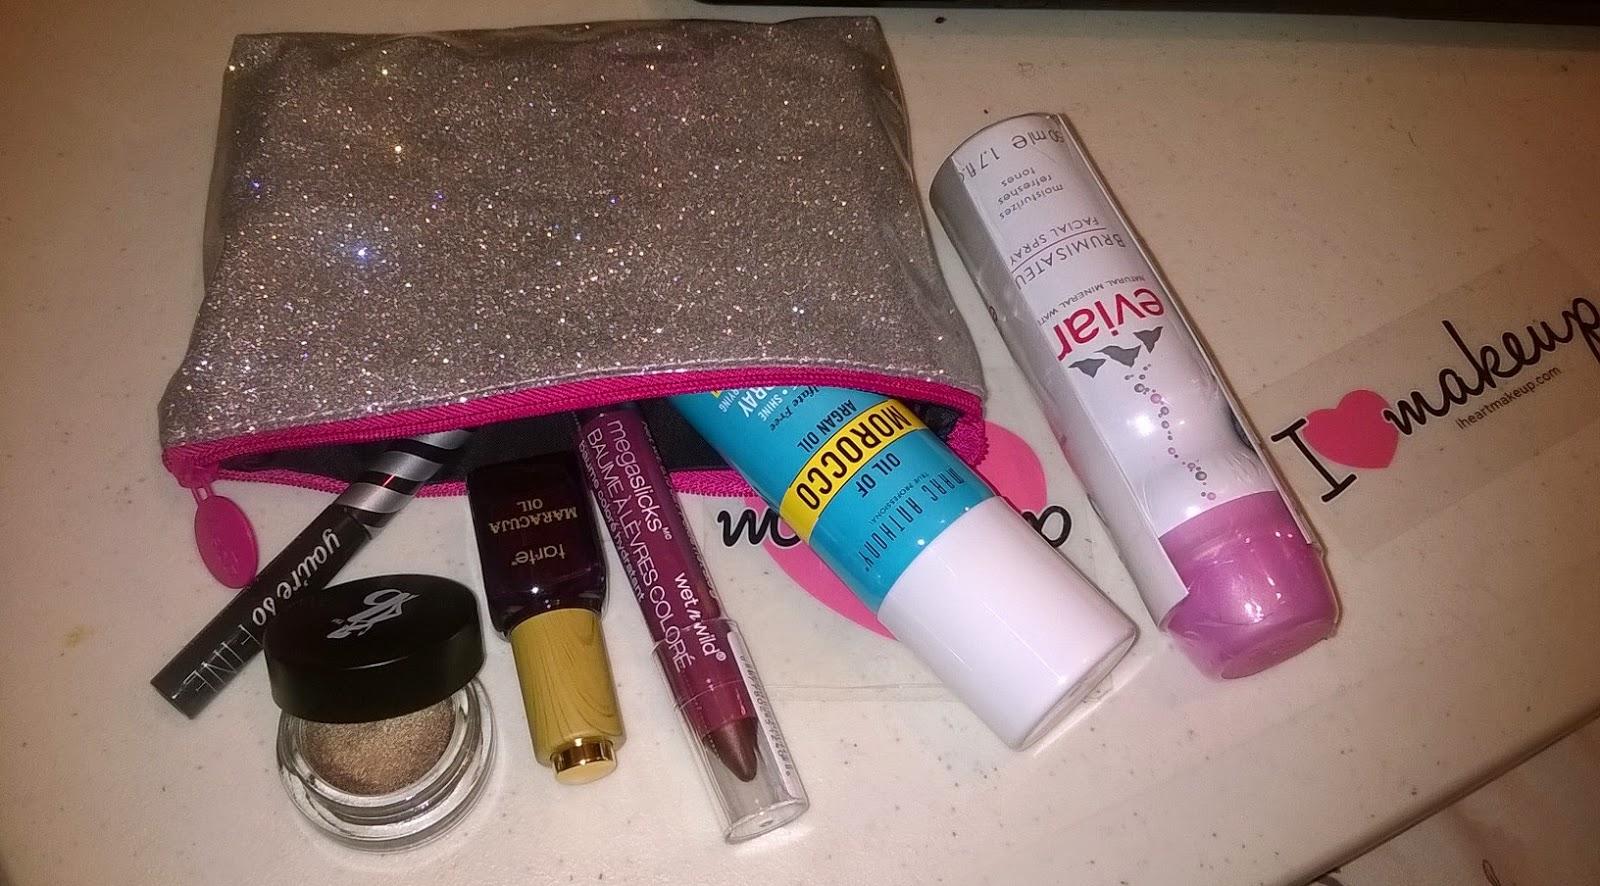 Ipsy Glam Bag November 2014 Review